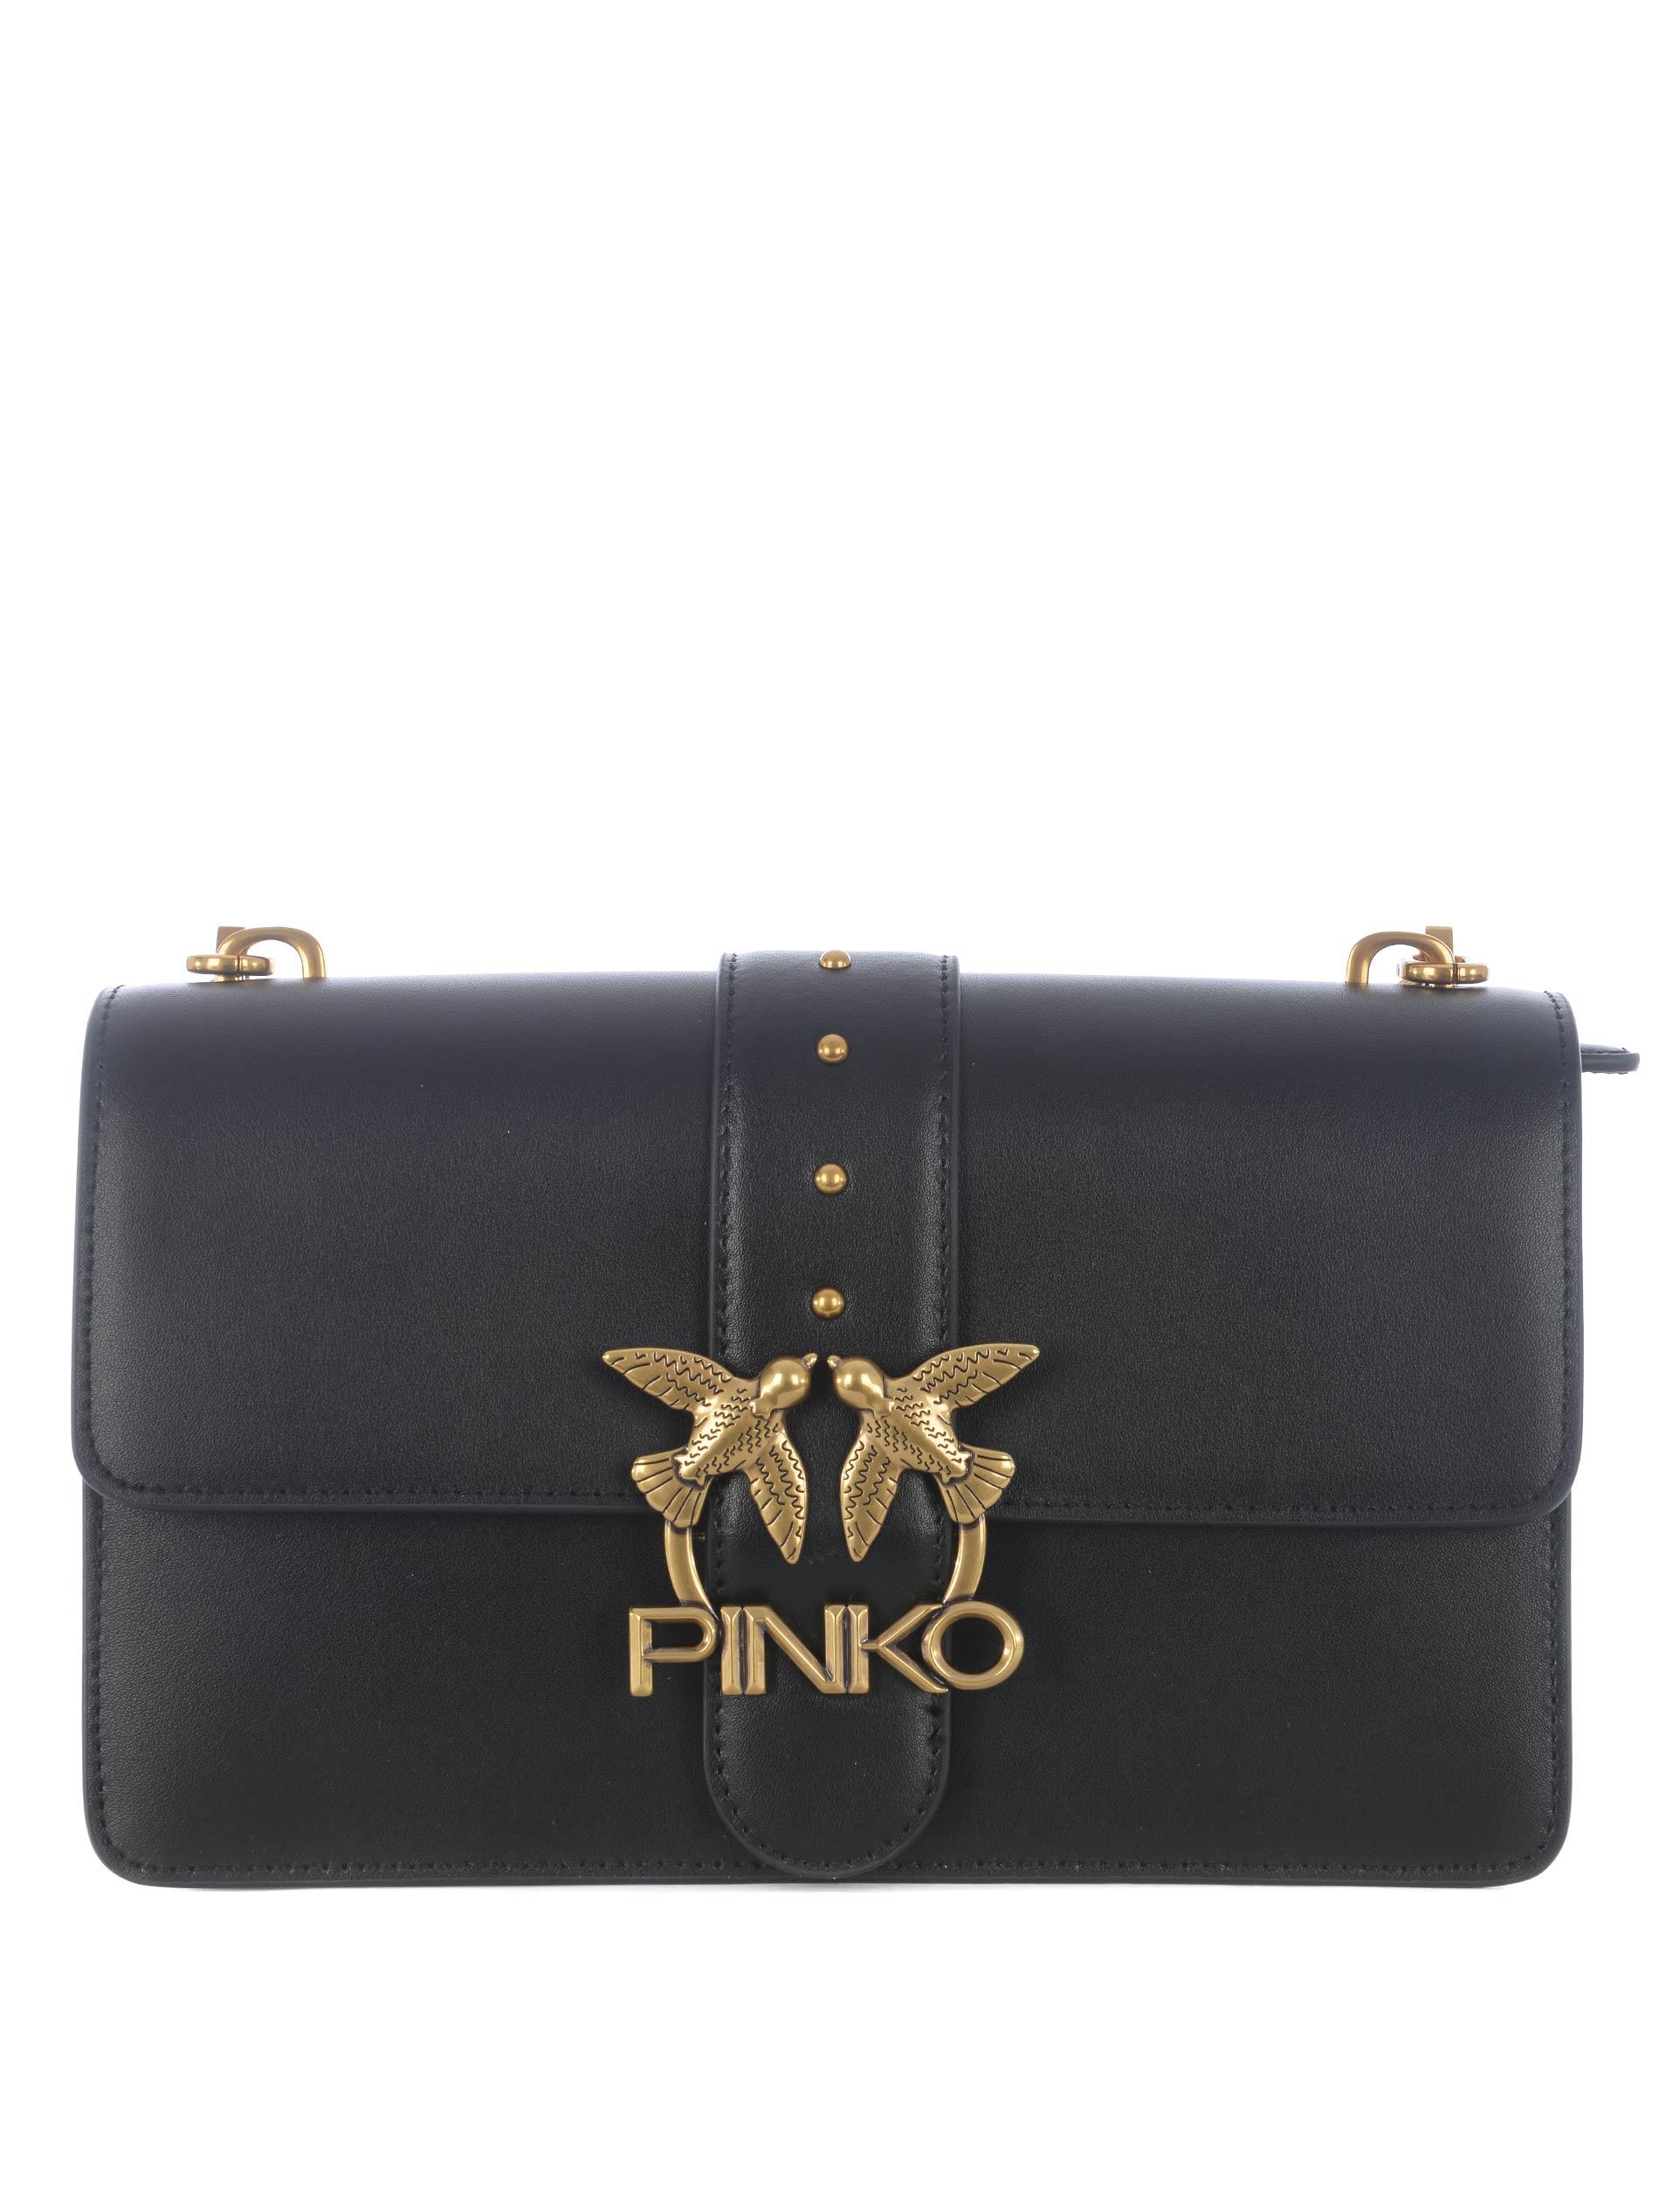 Borsa Pinko Love Classic Icon Simply 7 in pelle PINKO | 31 | 1P228G-Y6XTZ99